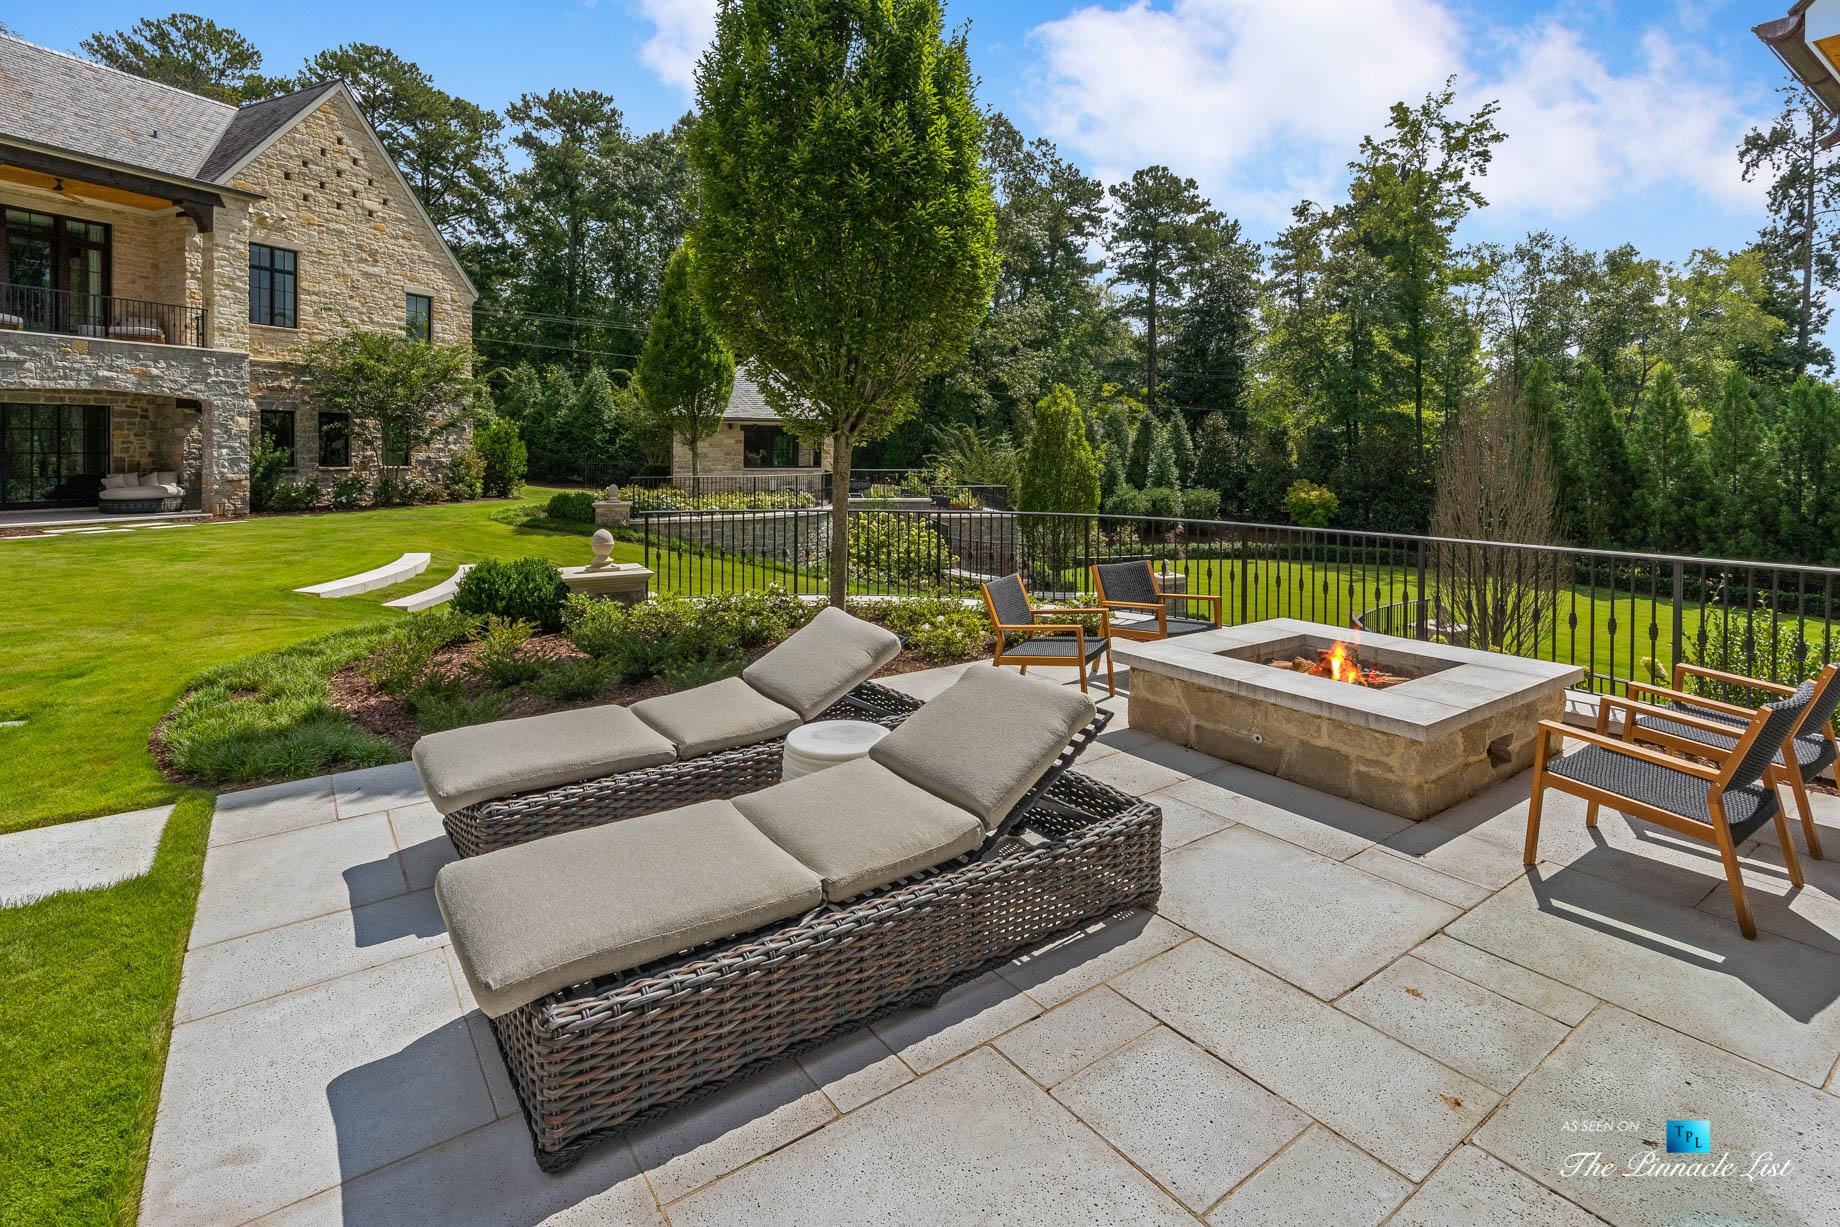 1150 W Garmon Rd, Atlanta, GA, USA – Backyard Lounge Chairs – Luxury Real Estate – Buckhead Estate Home